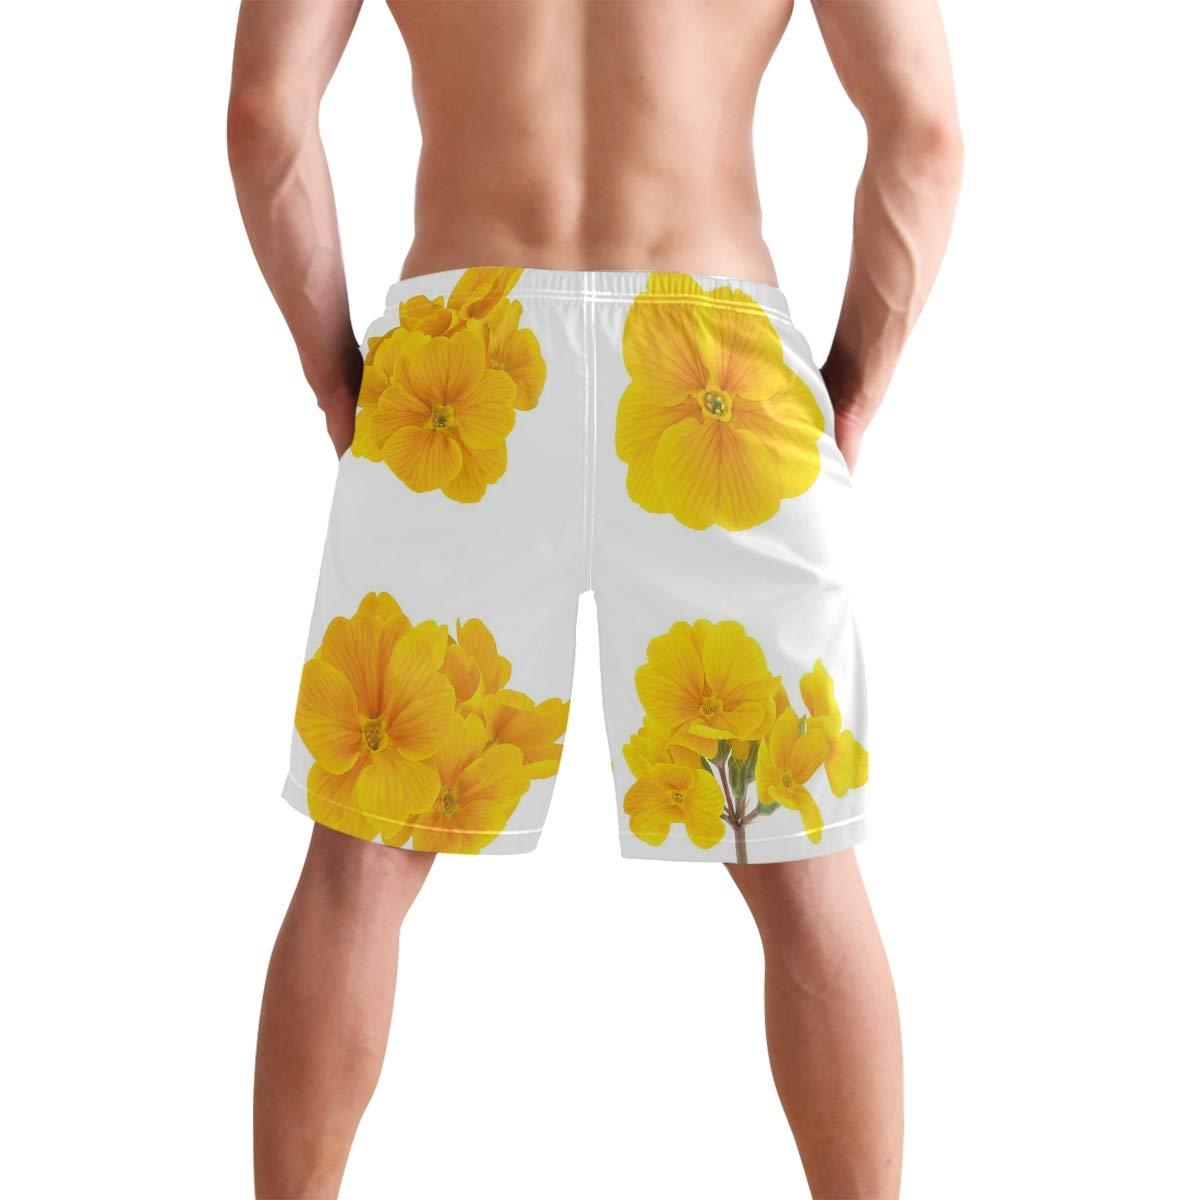 YOLOLIS Yellow Flower Fashion Mens Swim Trunks Quick Dry Boardshorts